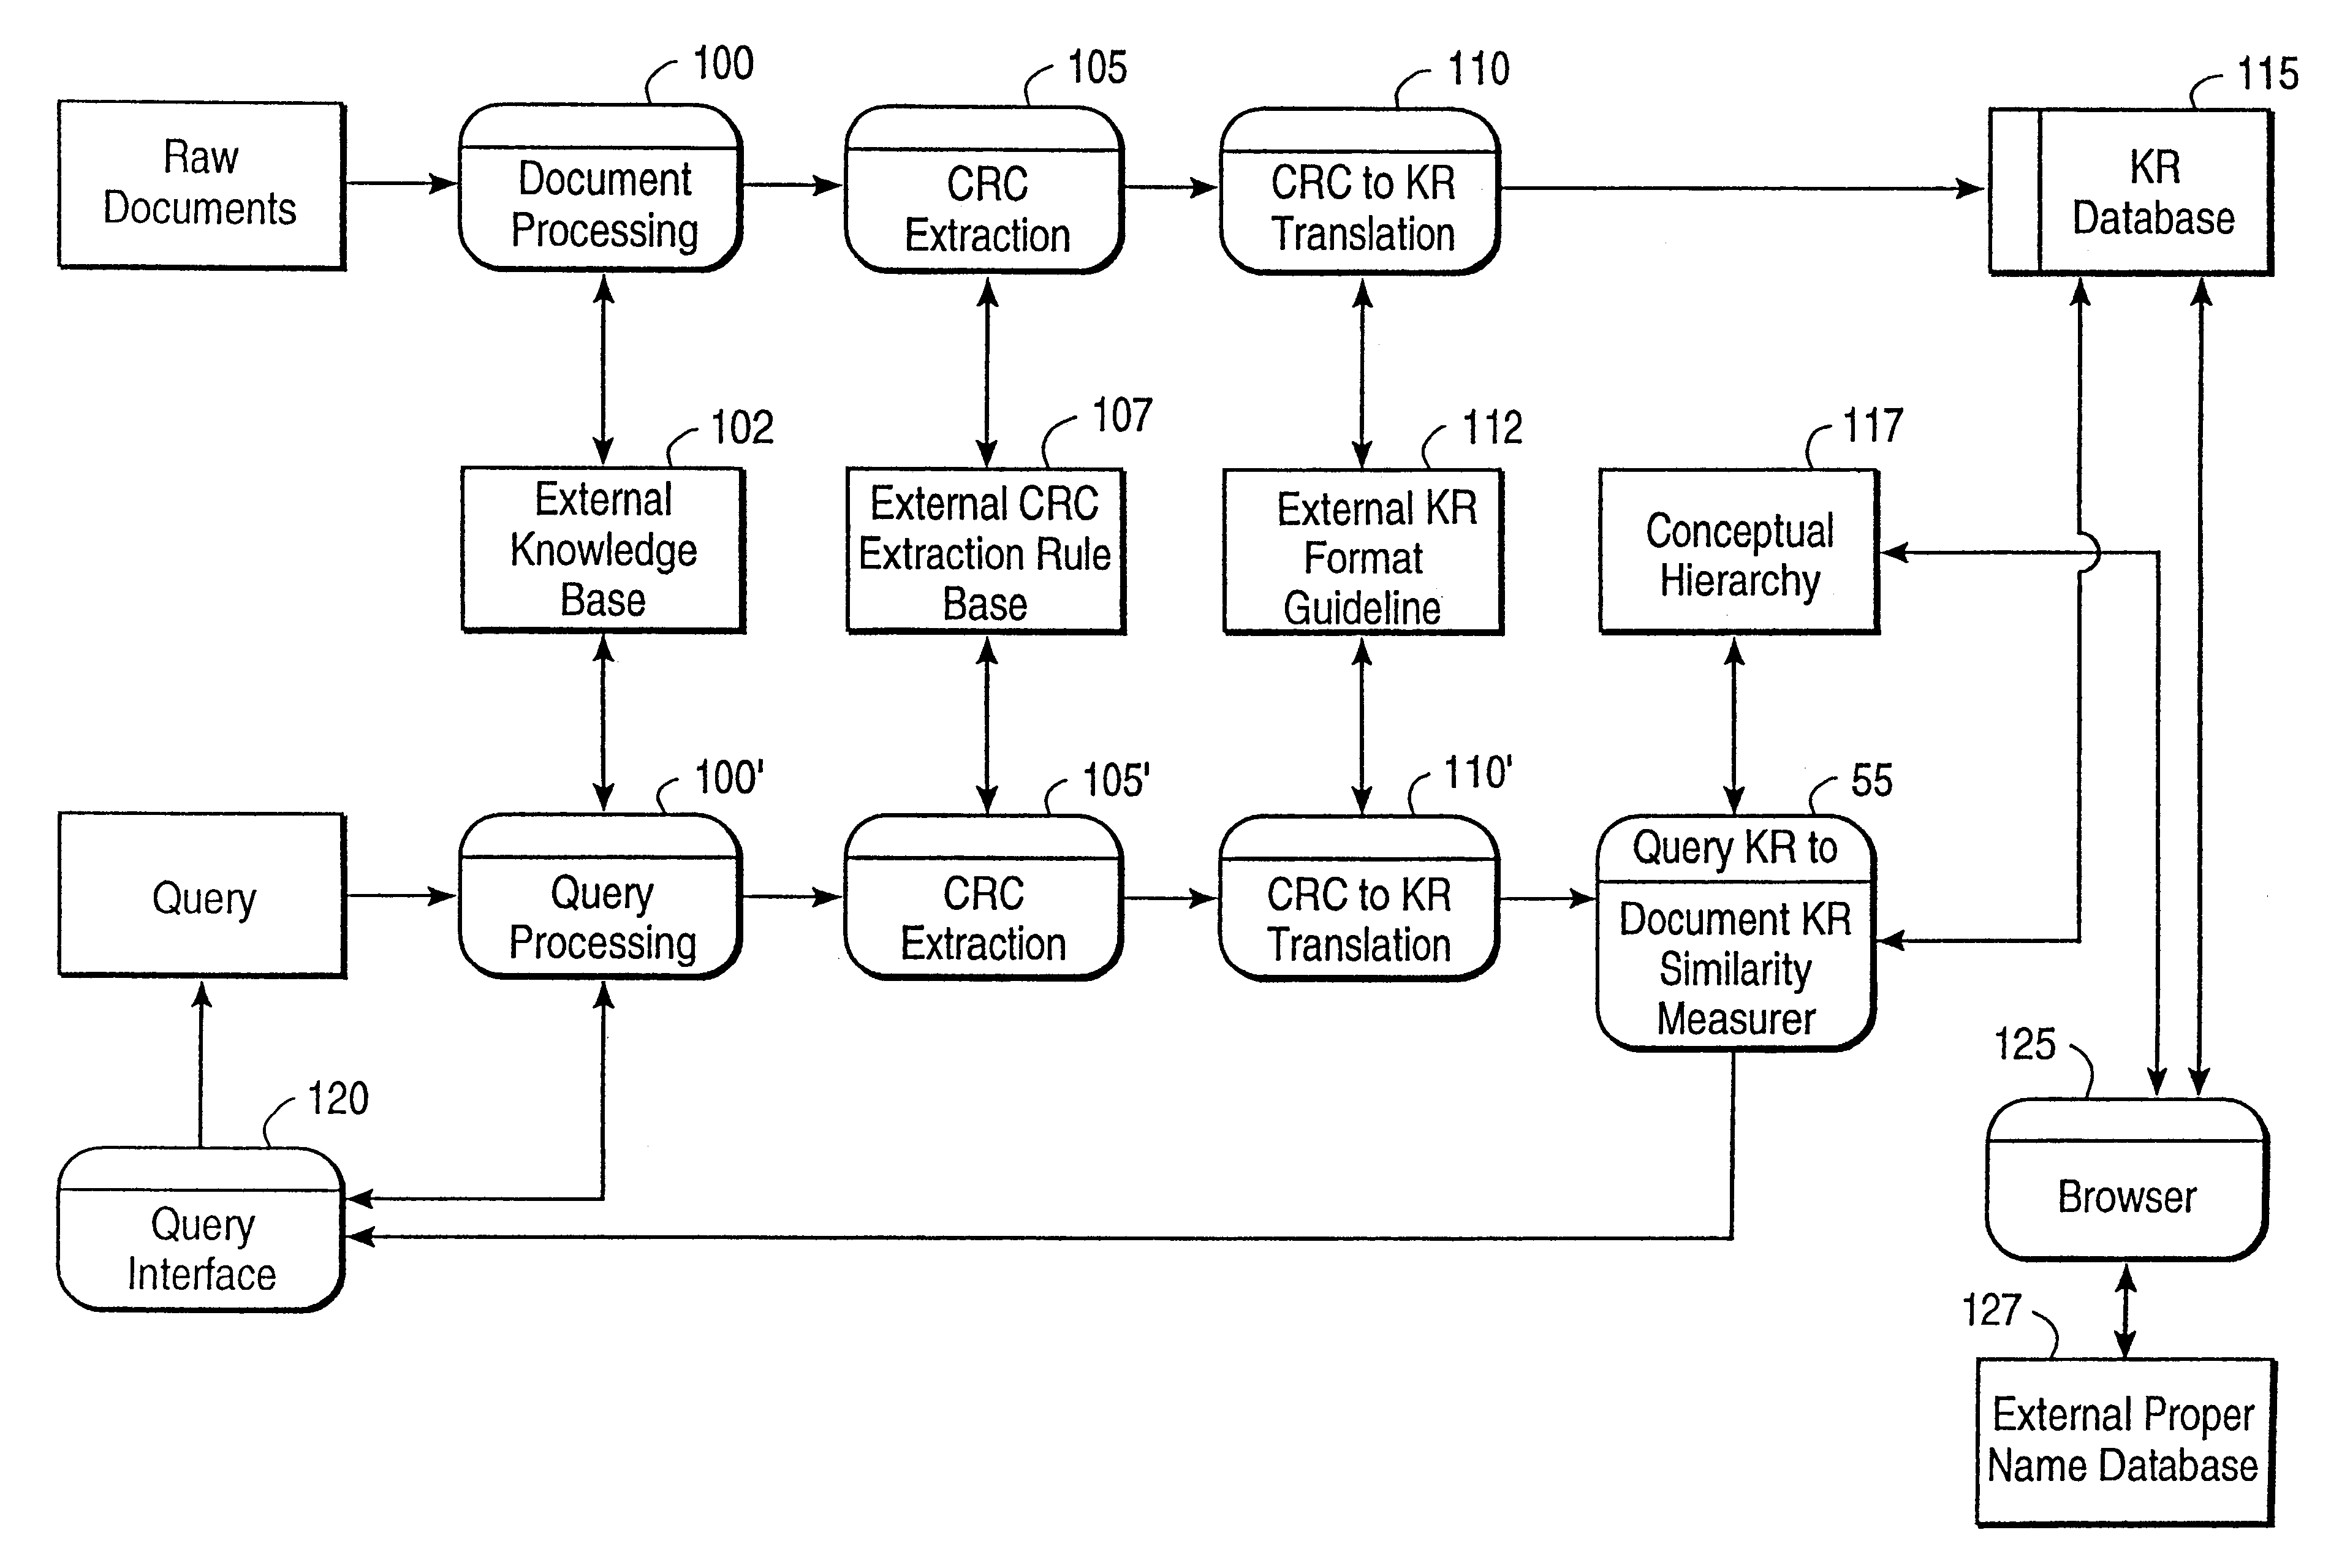 Patent US 6,263,335 B1